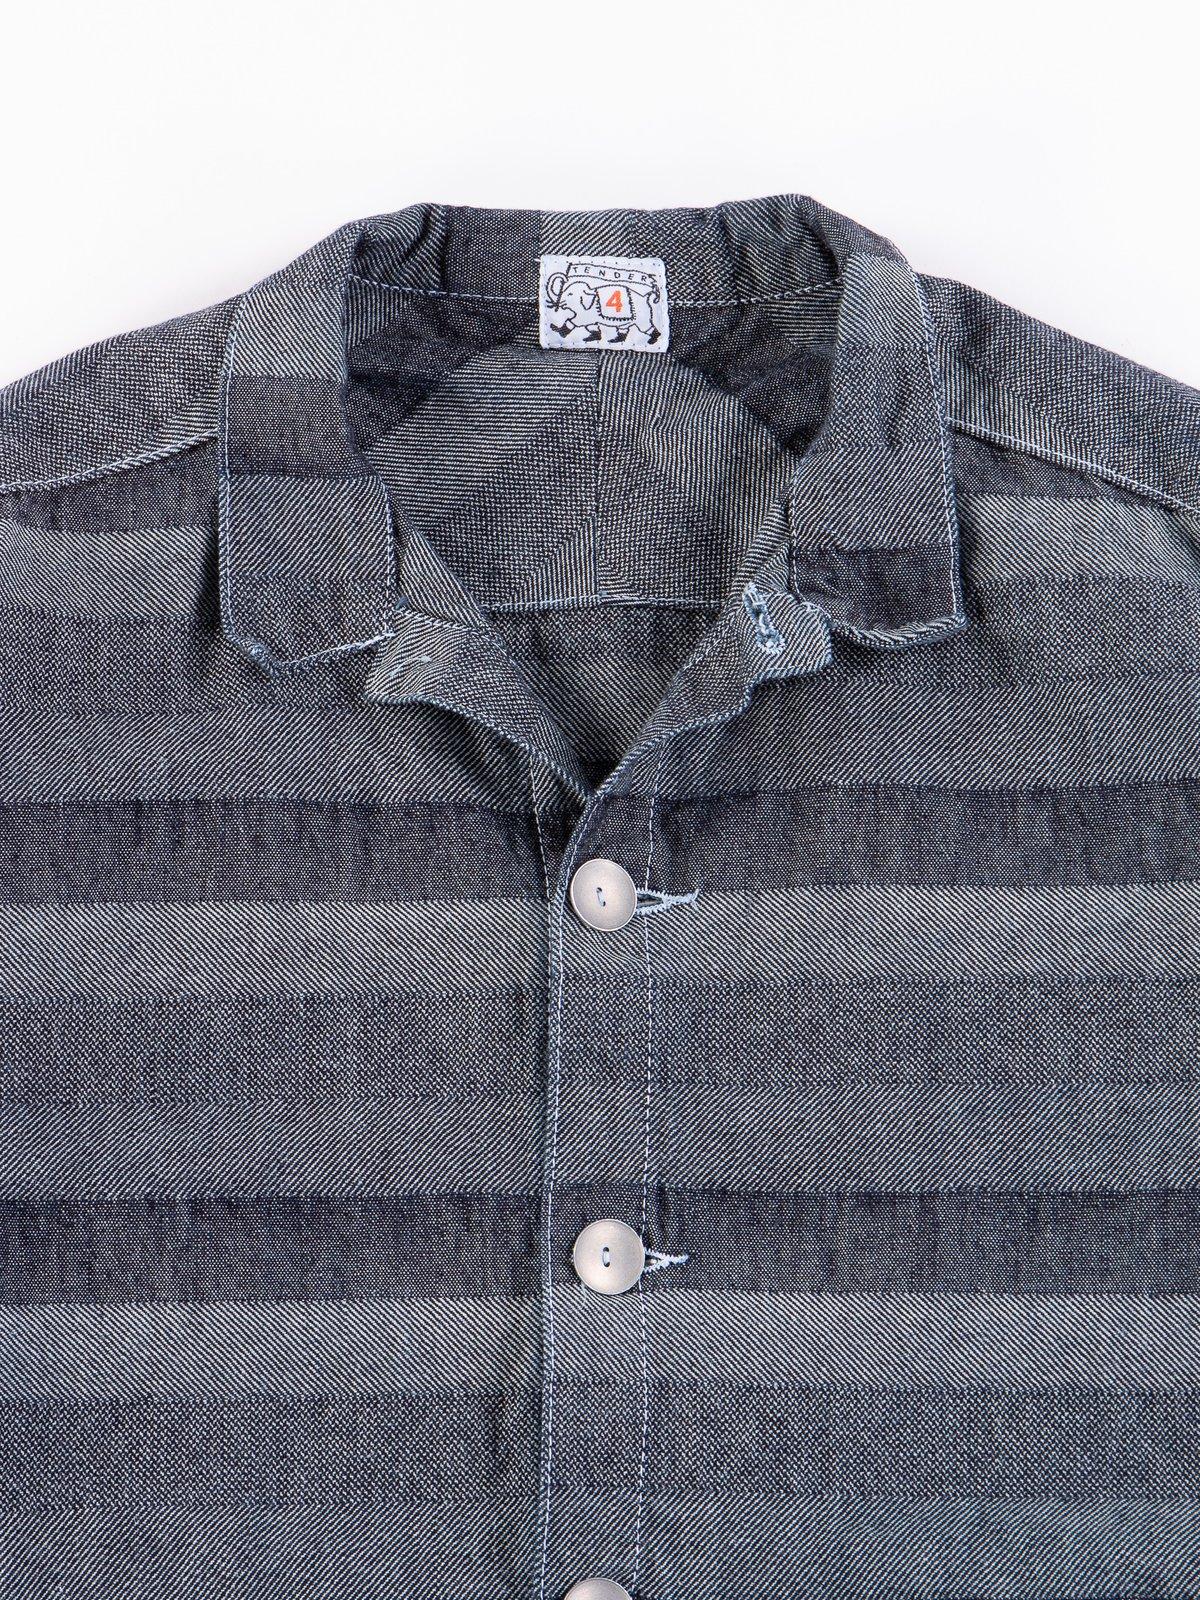 Rinse Washed Indigo Weaver's Blanket Stripe Floor Shirt - Image 4